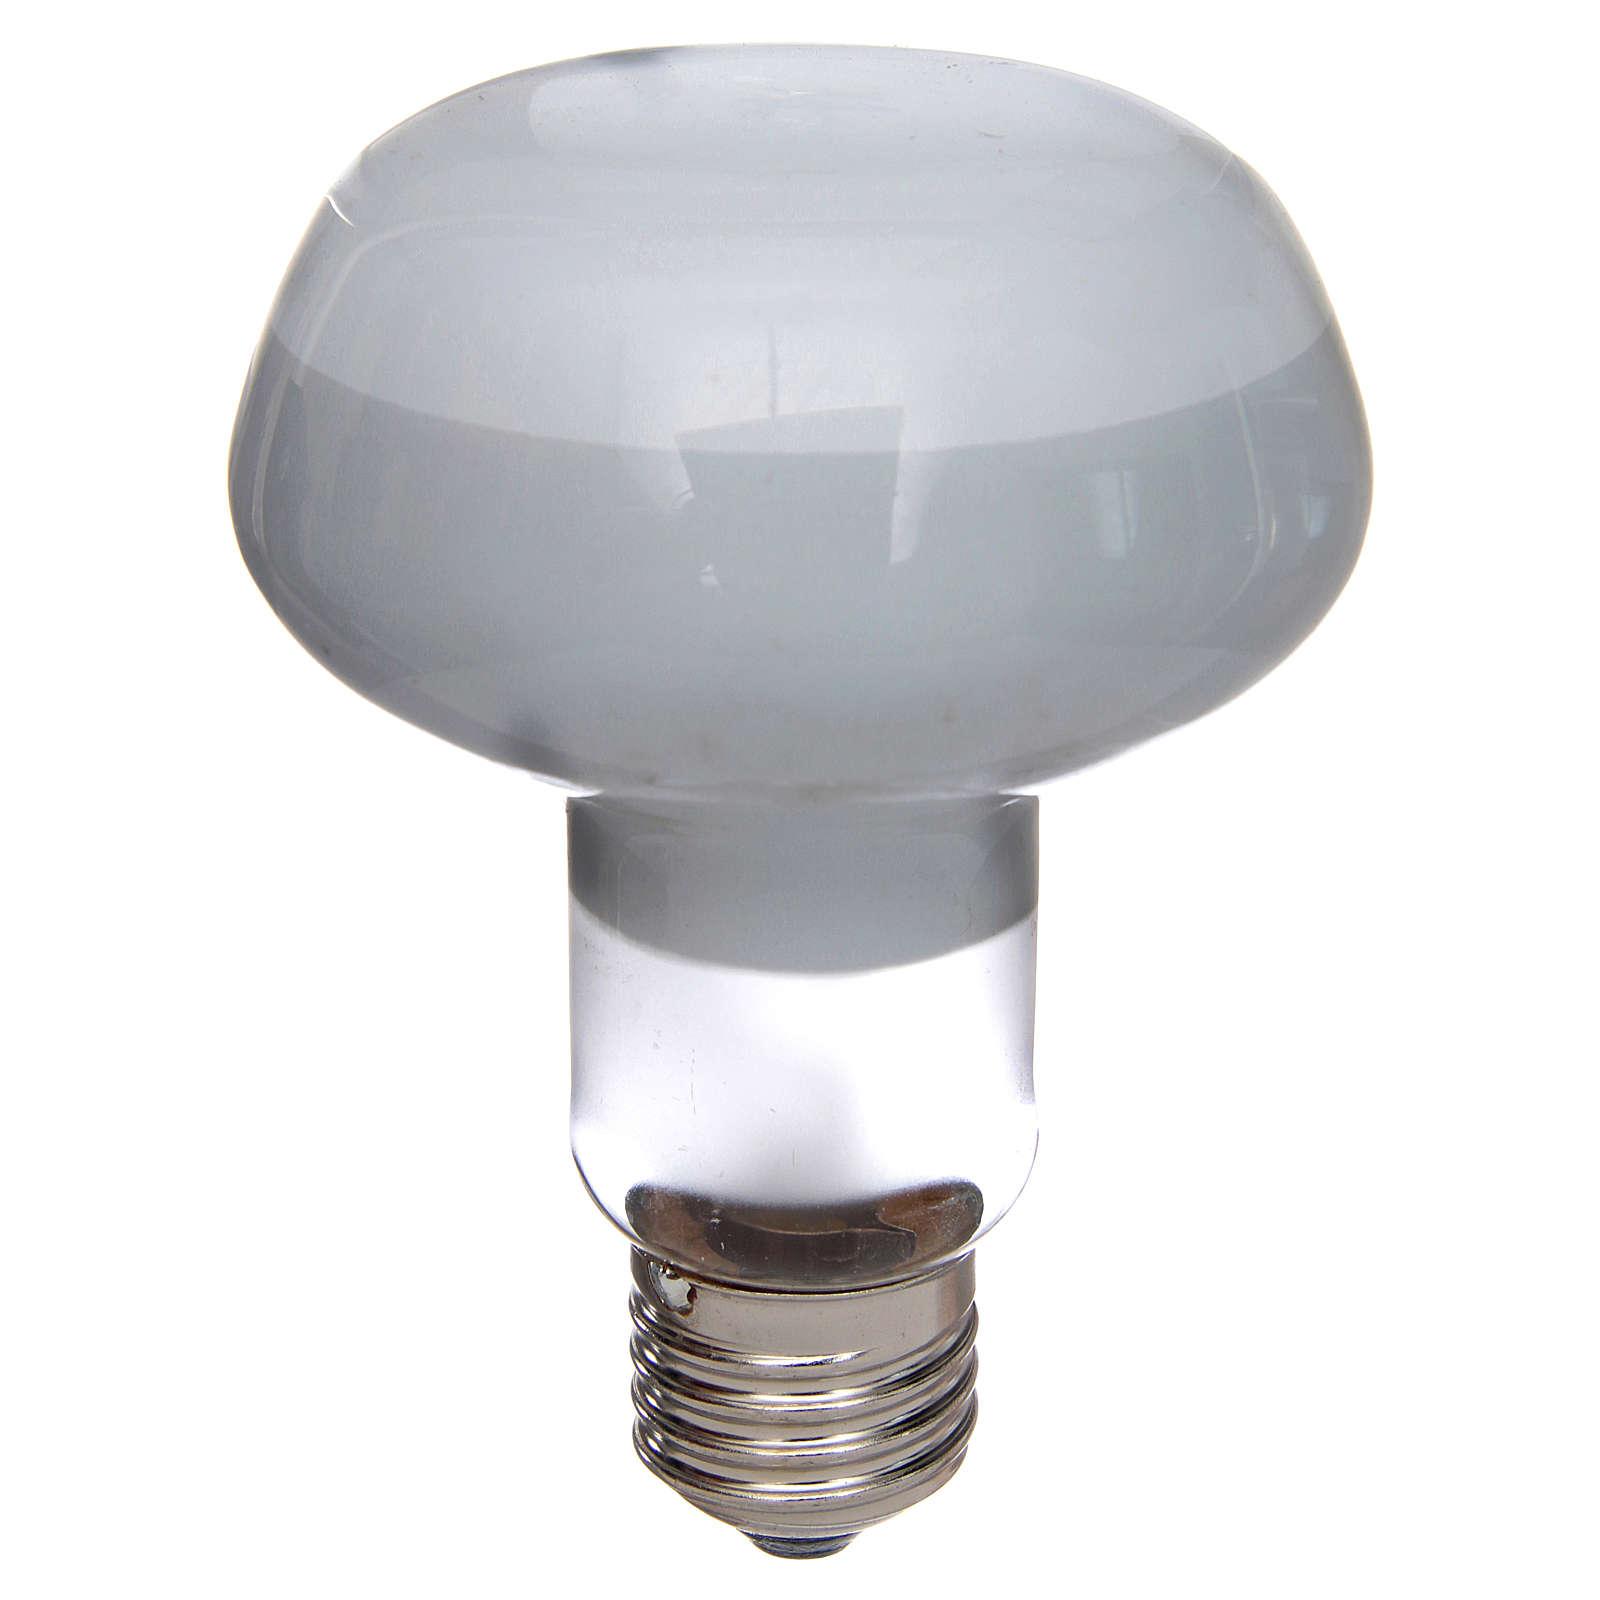 lampe diffuses licht 80 wei e27 krippenbeleuchtung online verfauf auf holyart. Black Bedroom Furniture Sets. Home Design Ideas